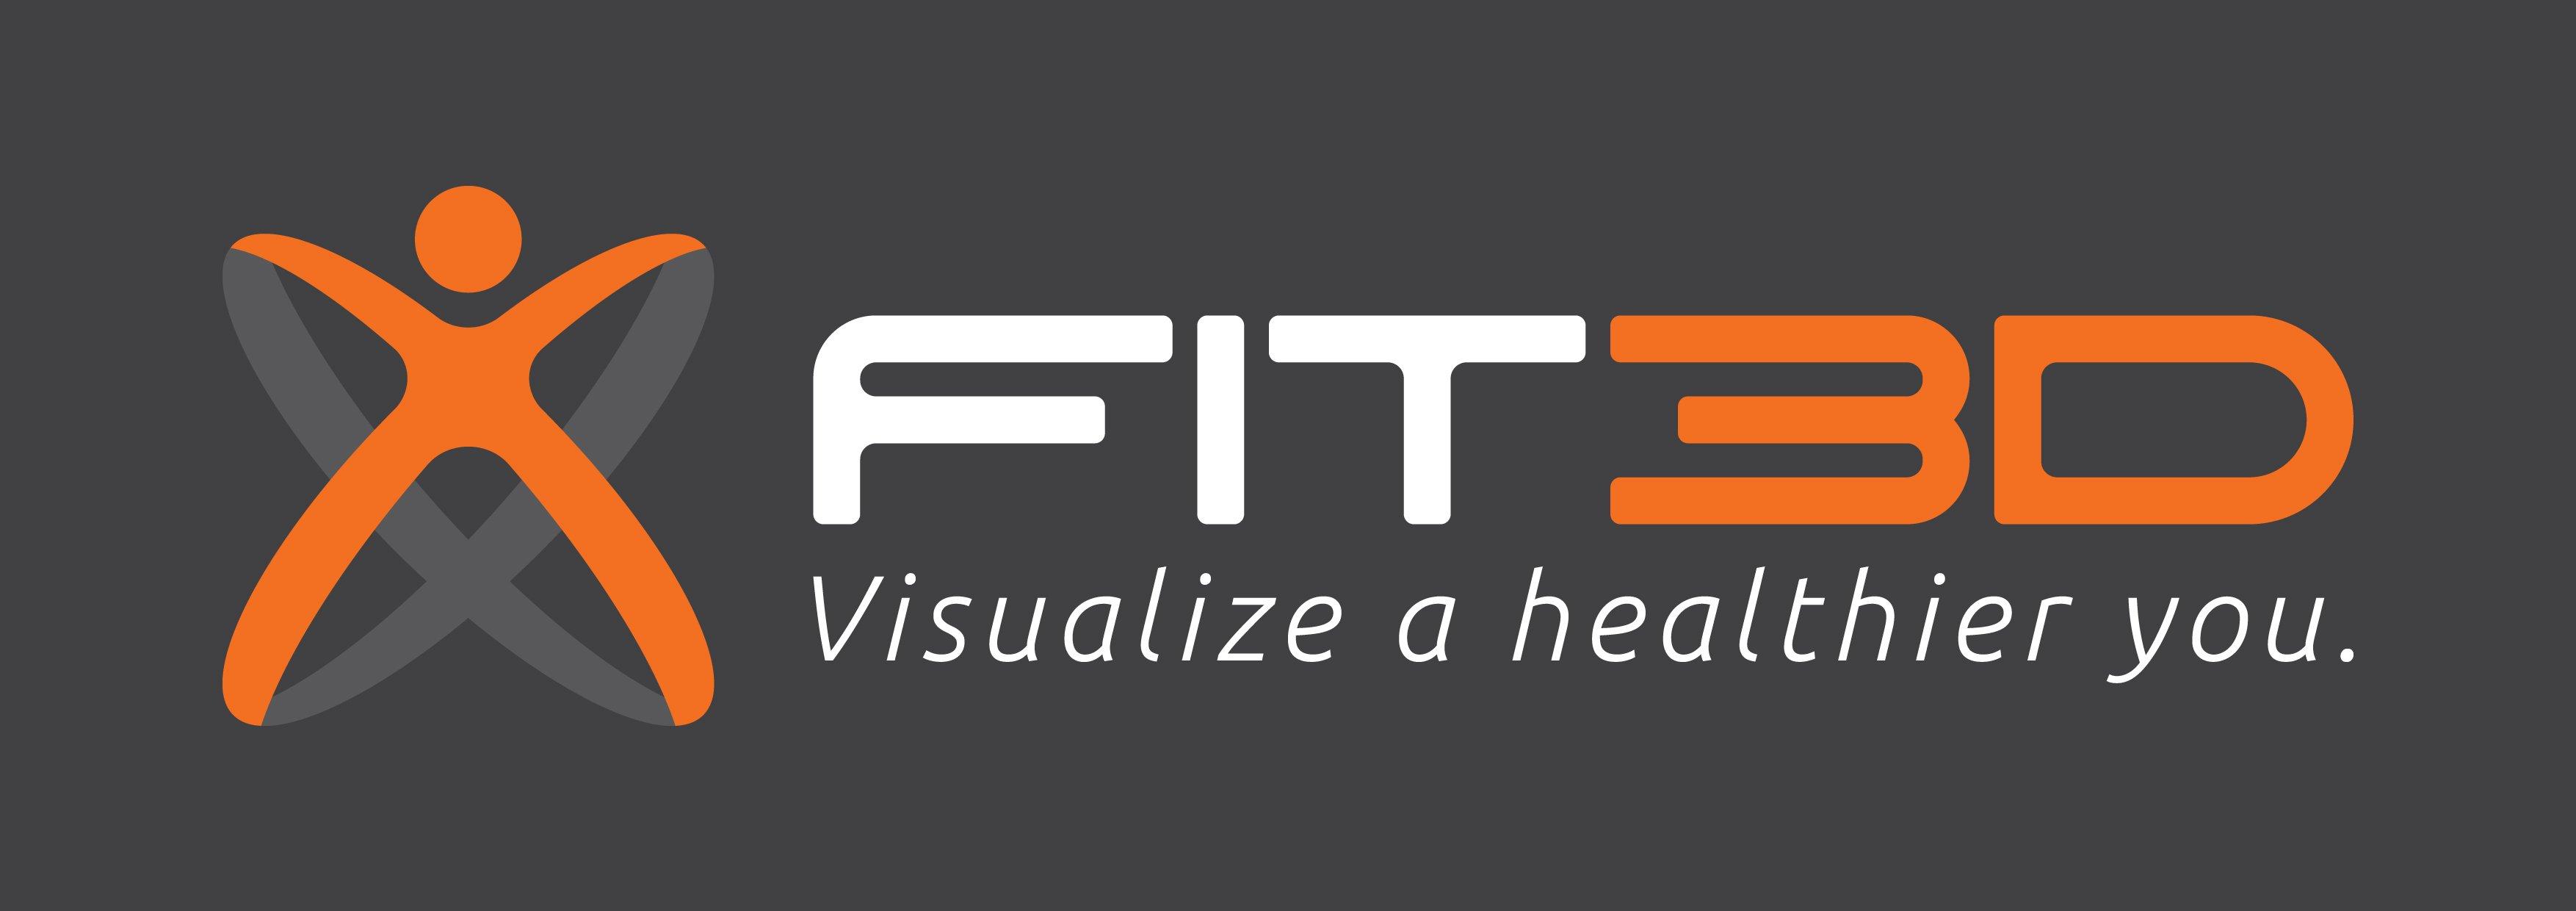 fit3d_full_logo_slogan_horizontal_black_bg